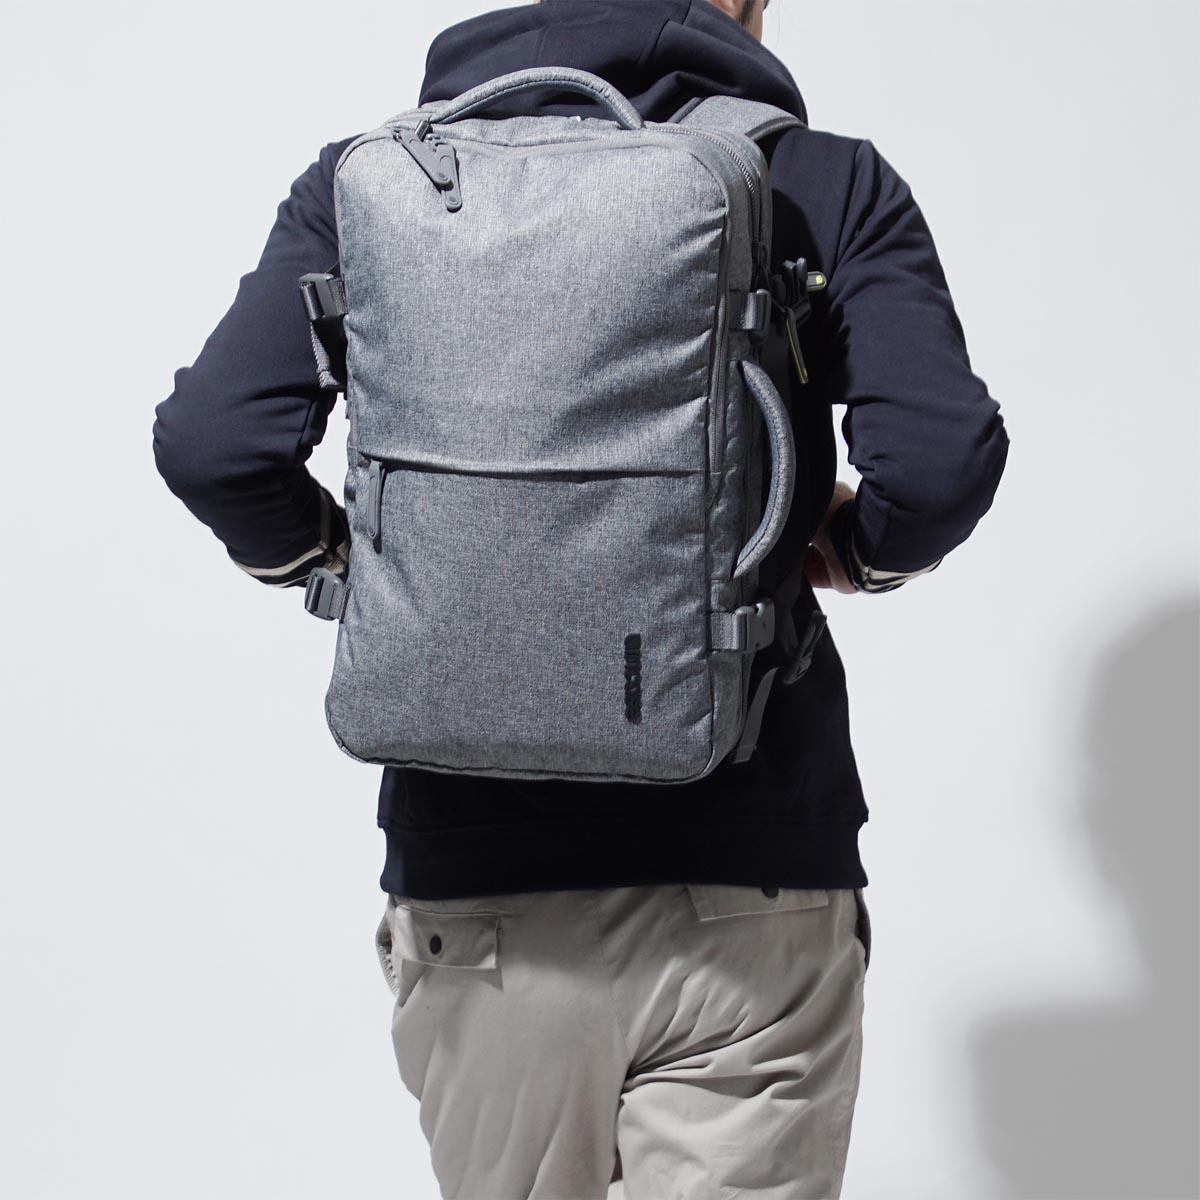 ab0db3b413 In case INCASE backpack rucksack EO TRAVEL BACKPACK HEATHERGREY gray system  cl90020 men